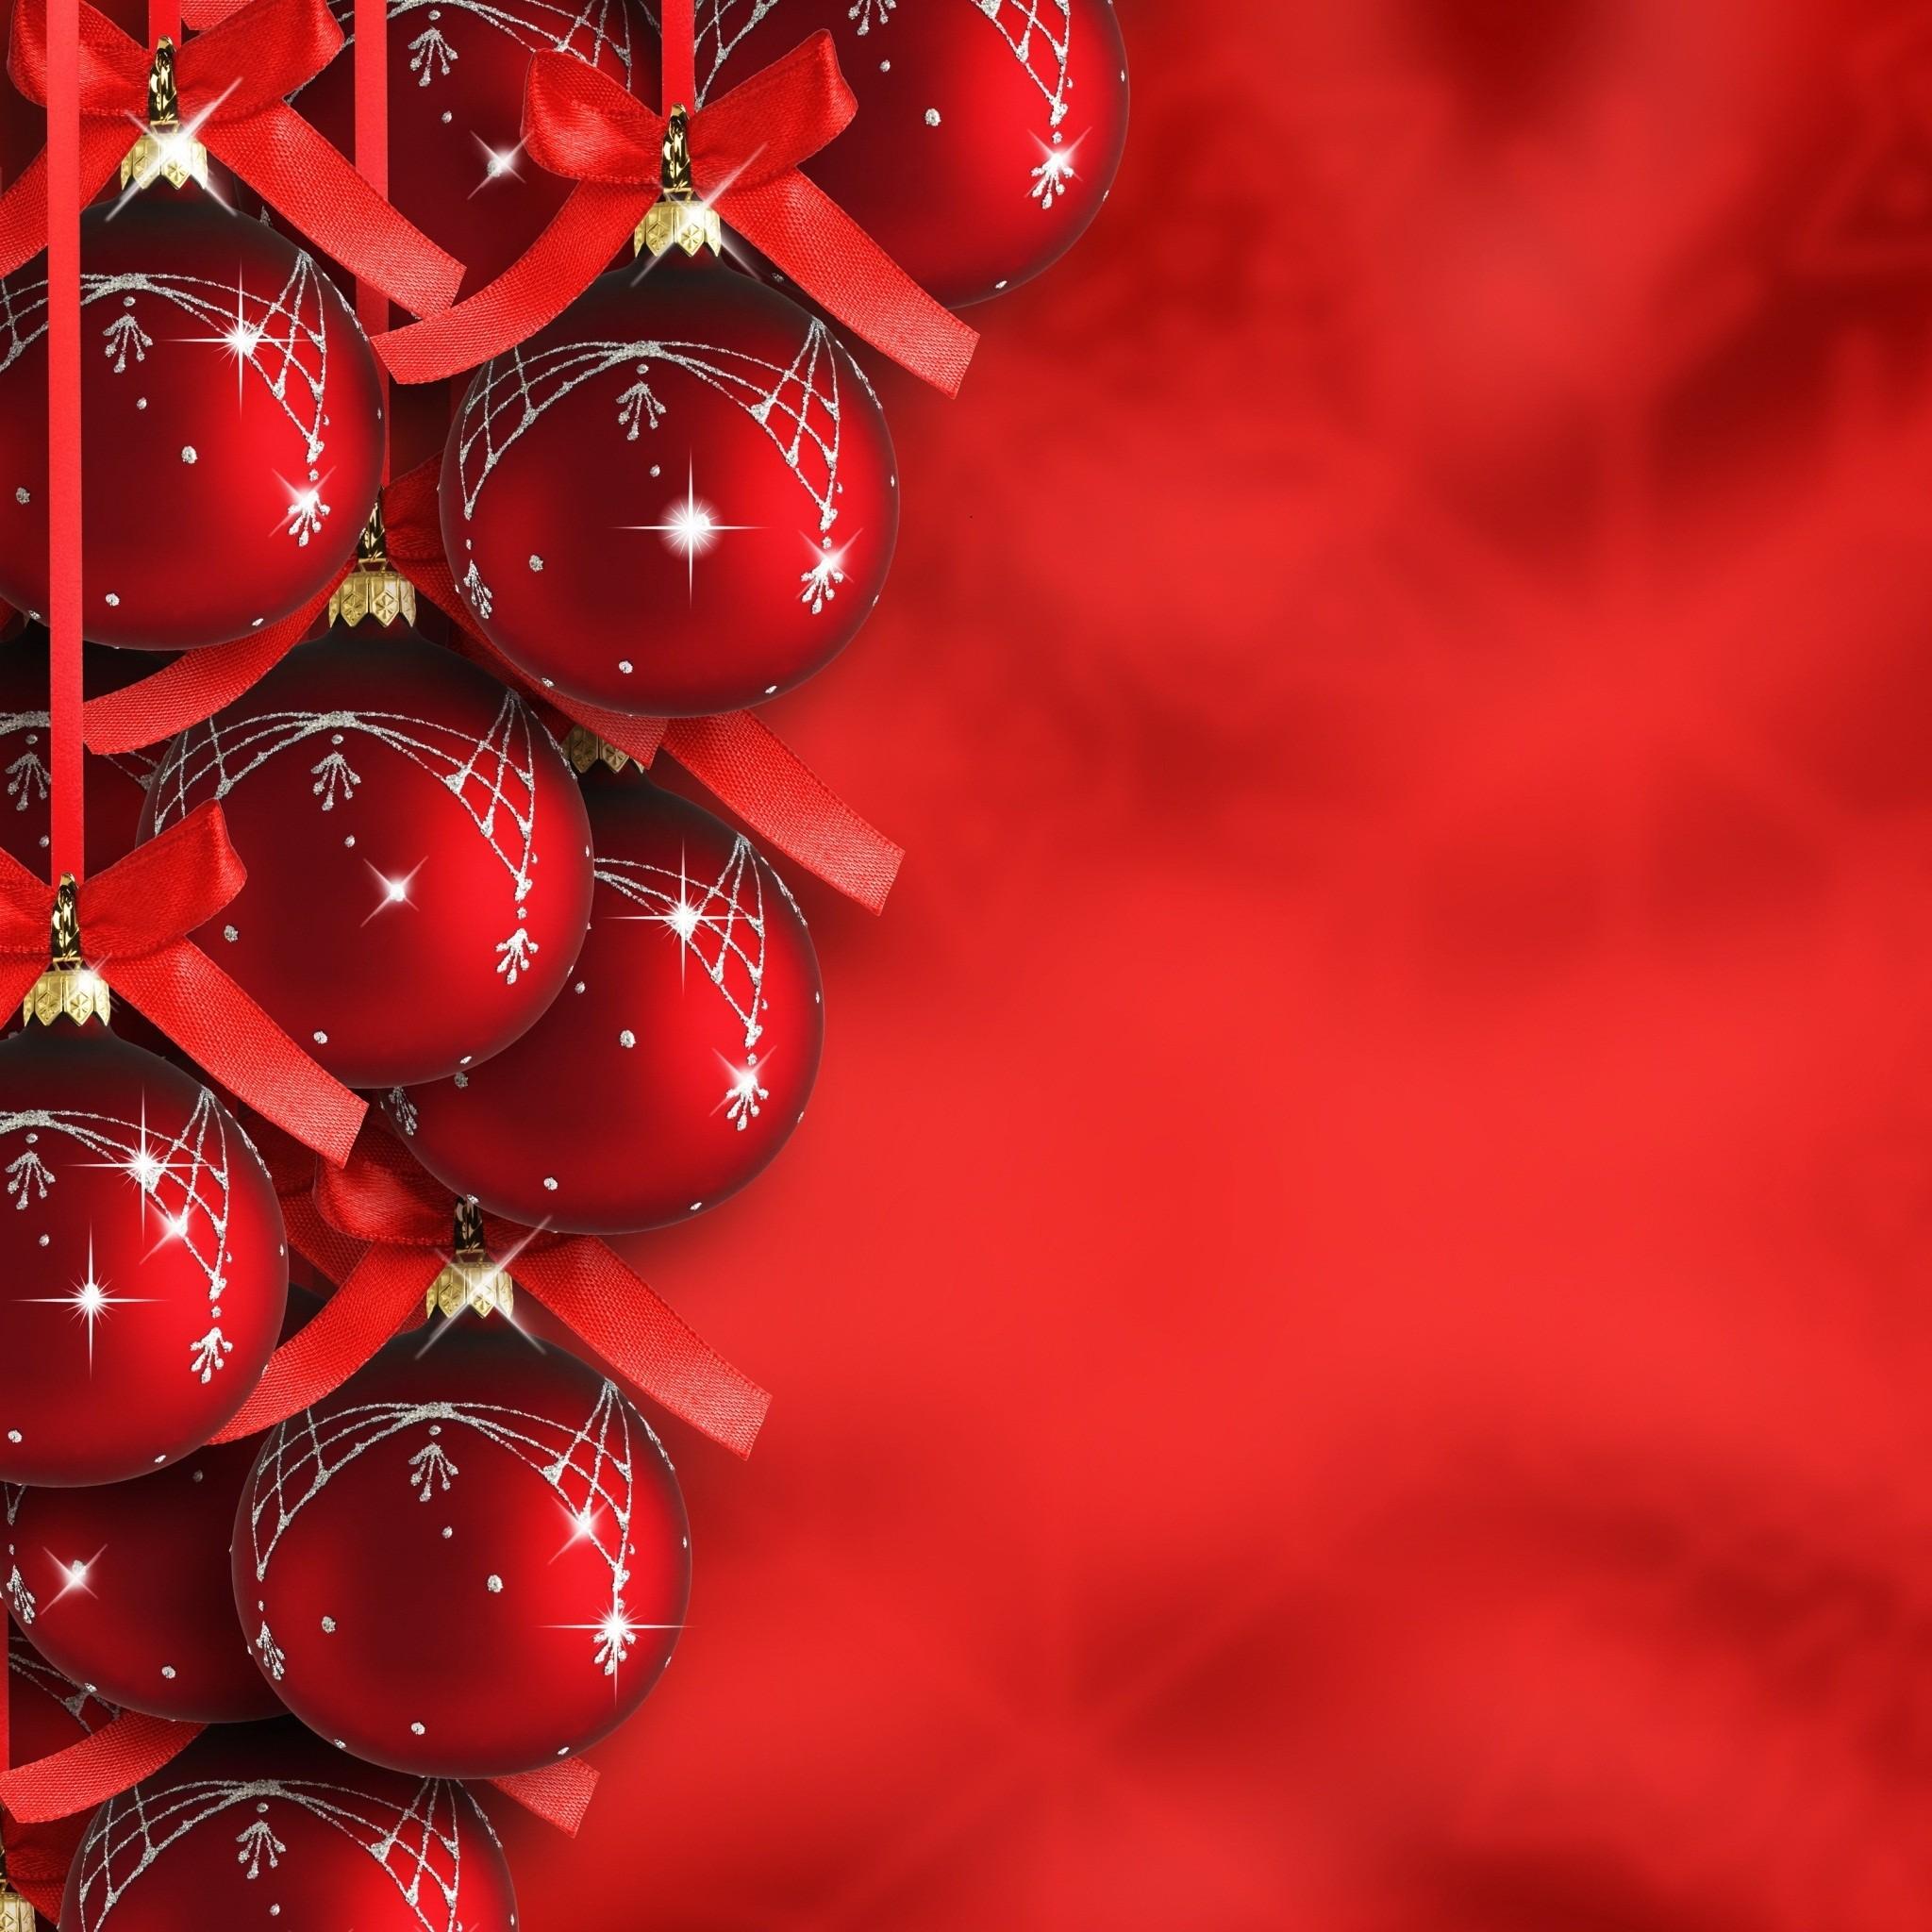 Christmas Wallpaper Tumblr ·① Download Free Amazing